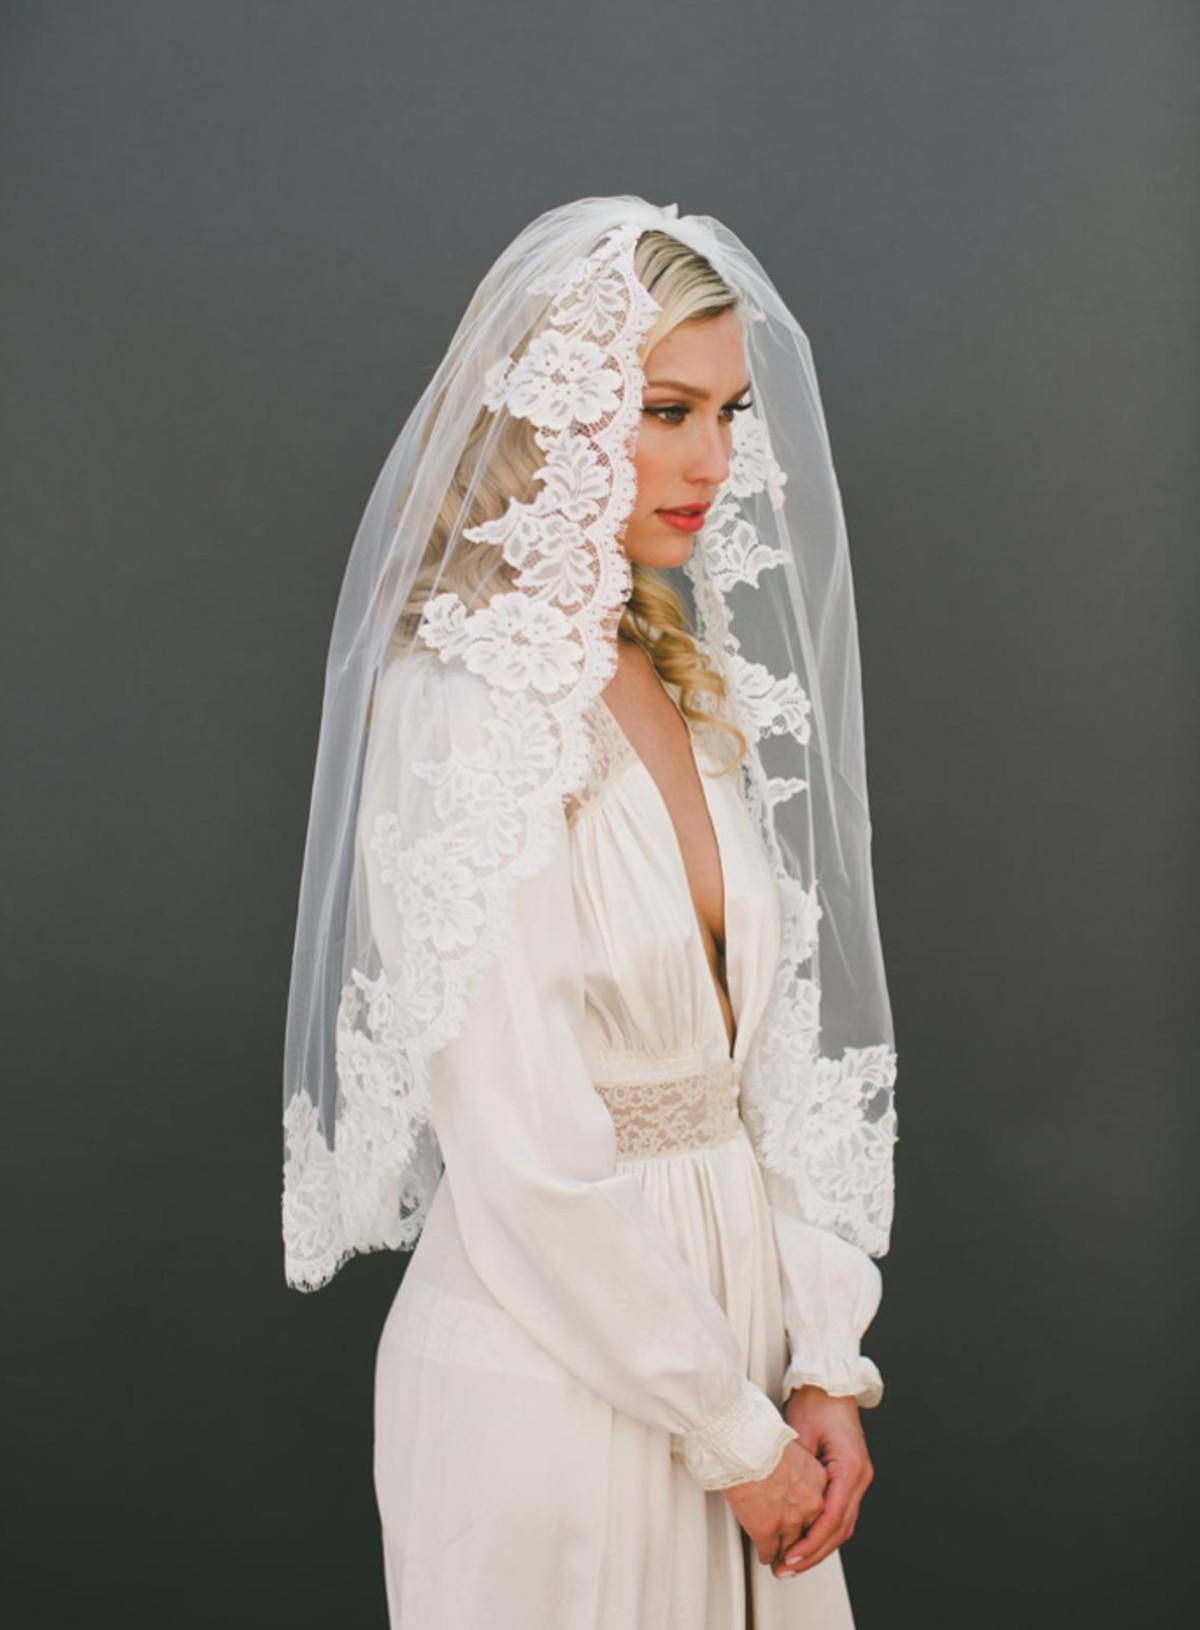 Lauren Veil_One Tier Mid Hip Length Bridal Veil with French Alençon Lace Edge